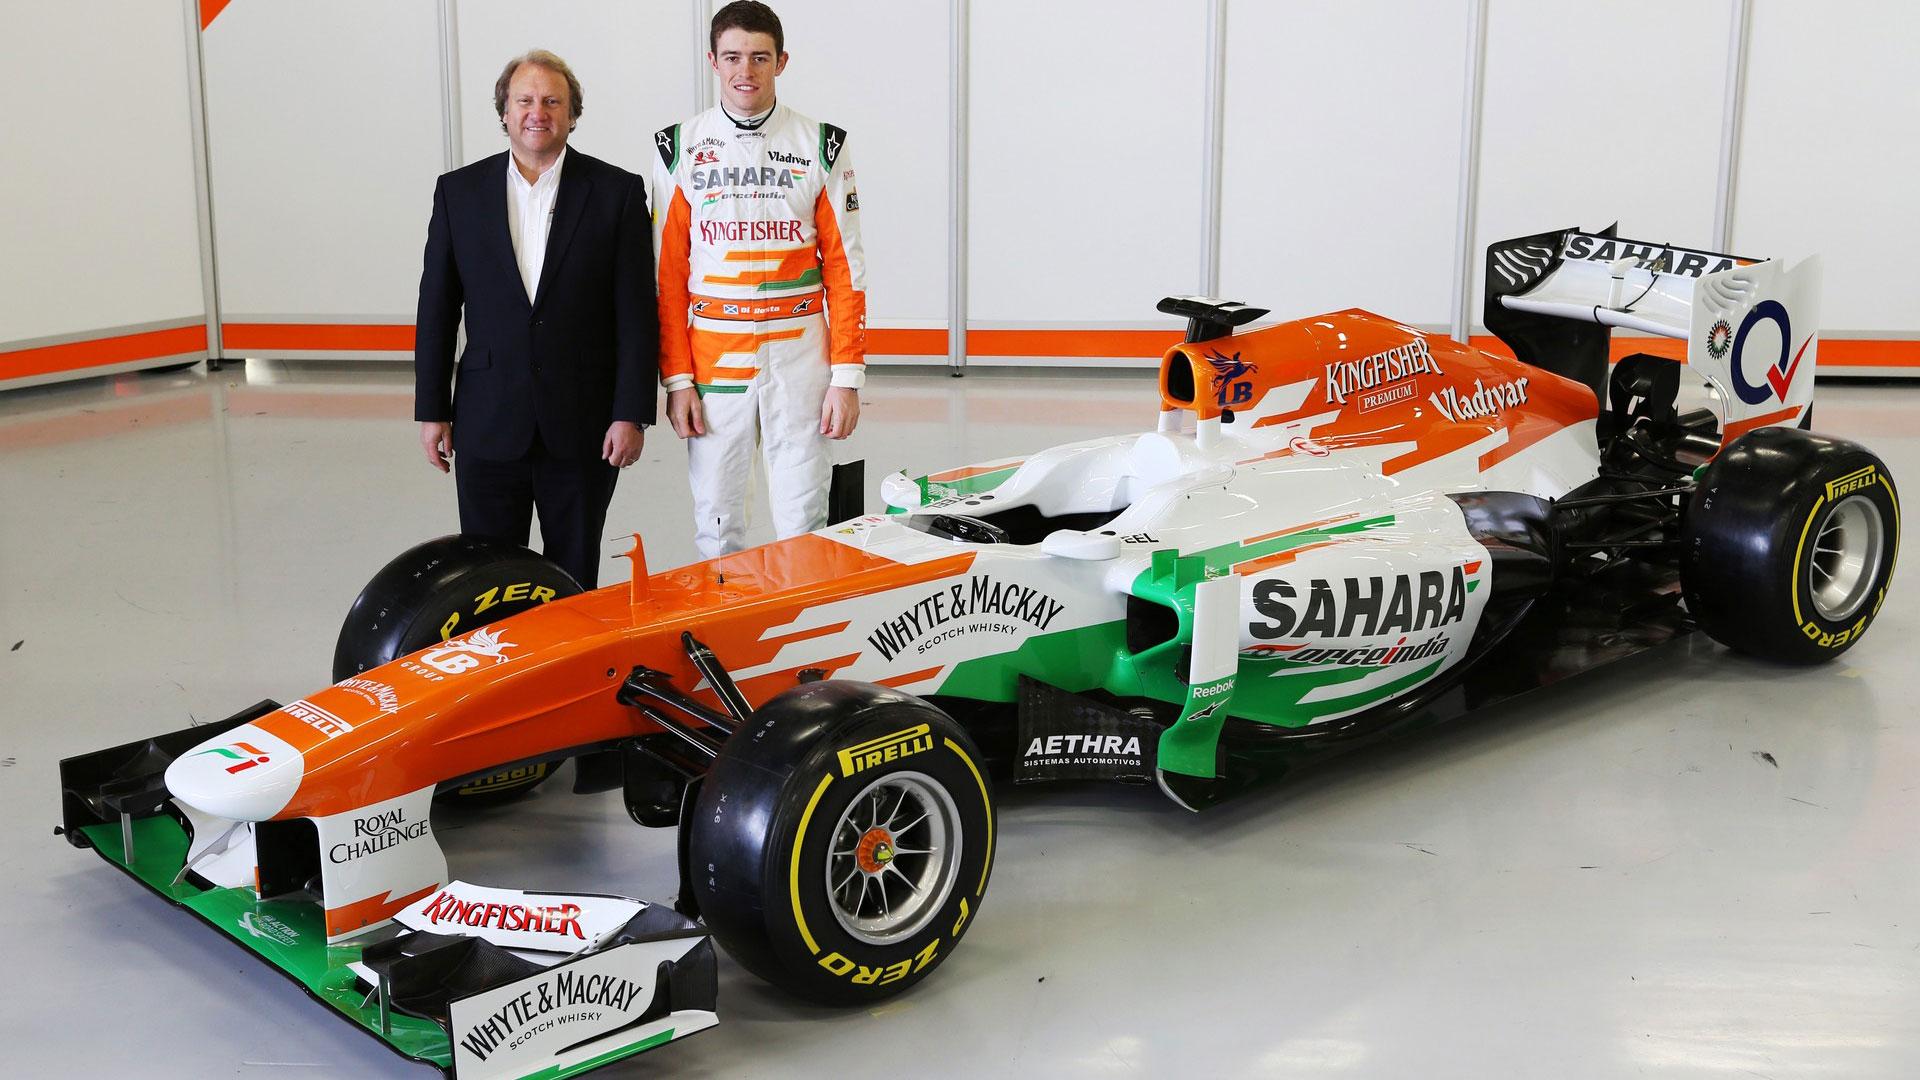 Hd Pictures 2013 Launch Force India Vjm06 F1 Car F1 Fansite Com